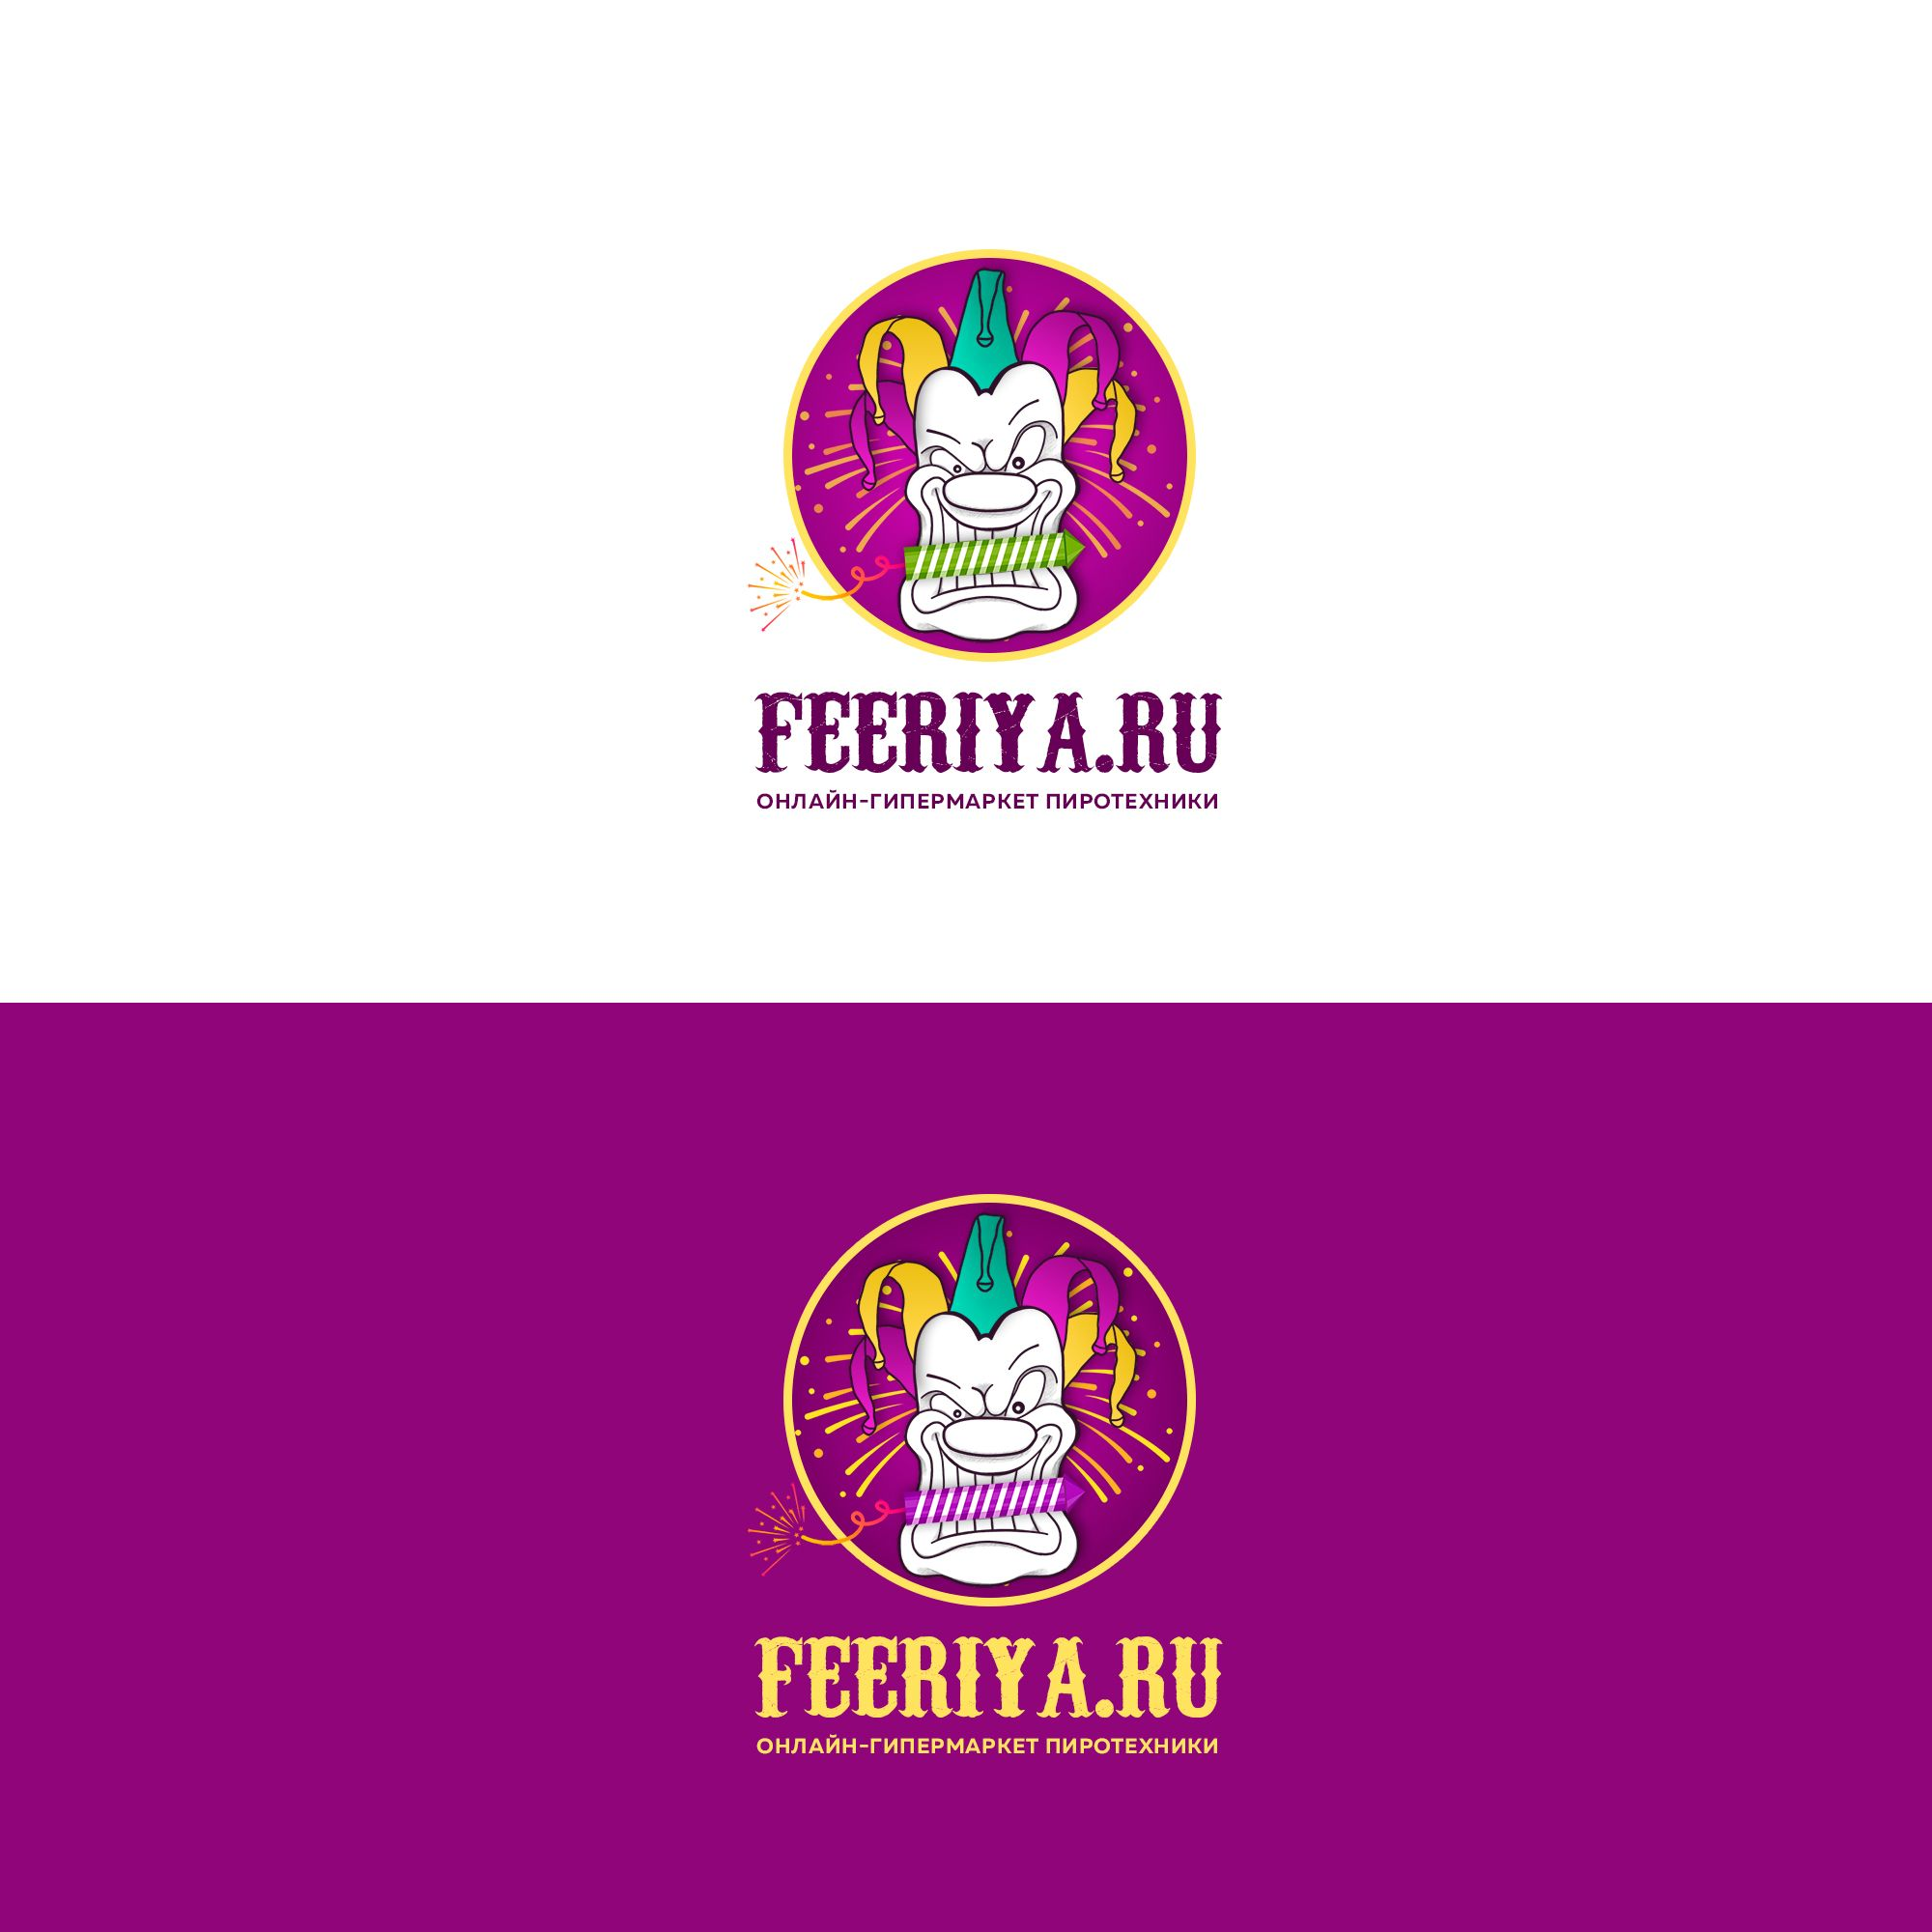 Логотип для feeriya.ru - дизайнер Splayd